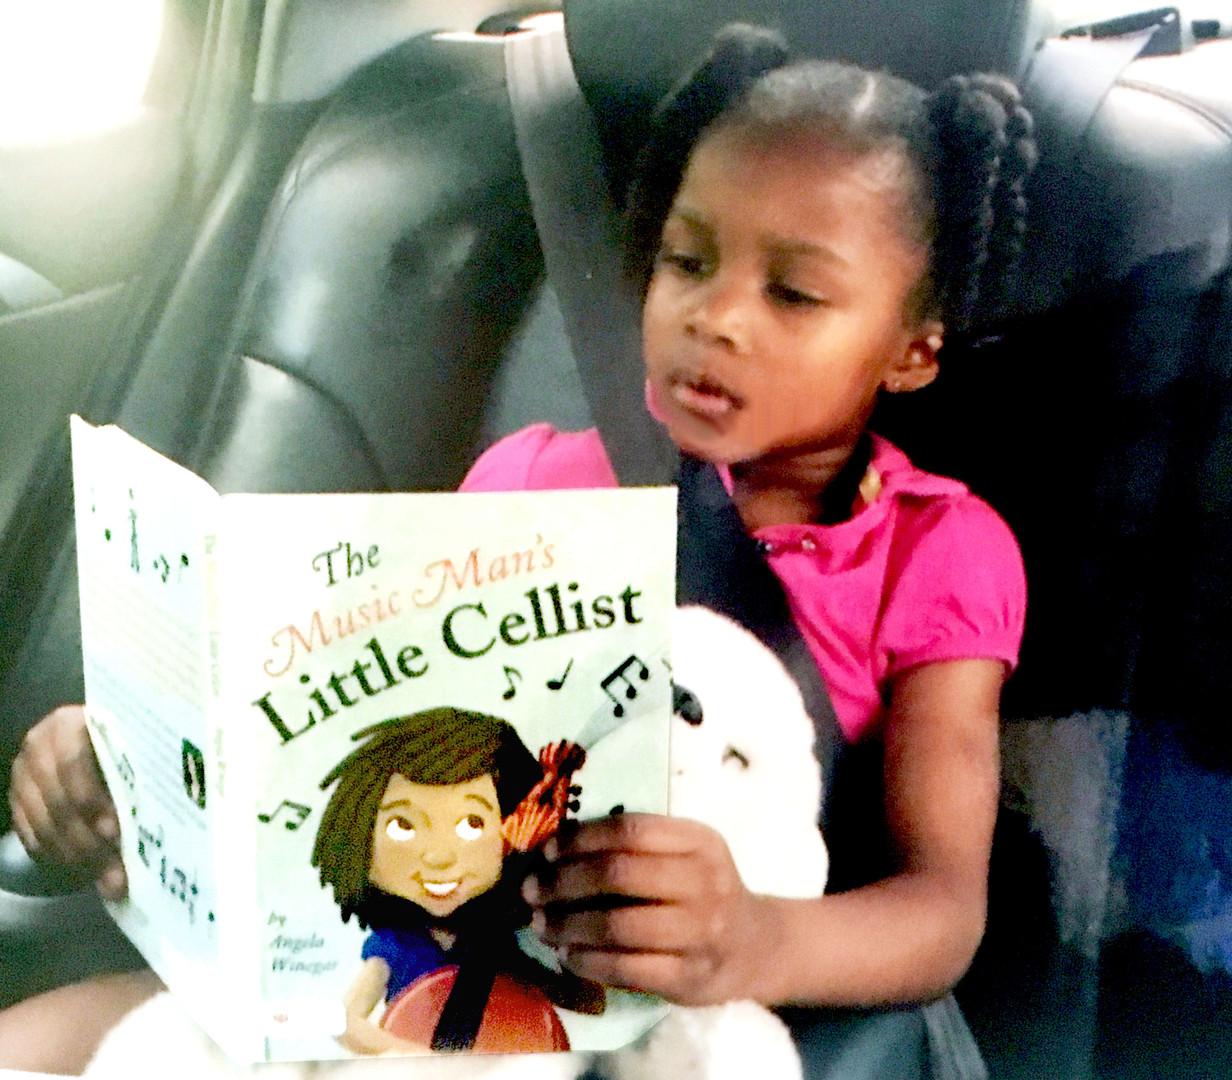 Reading at age 3.